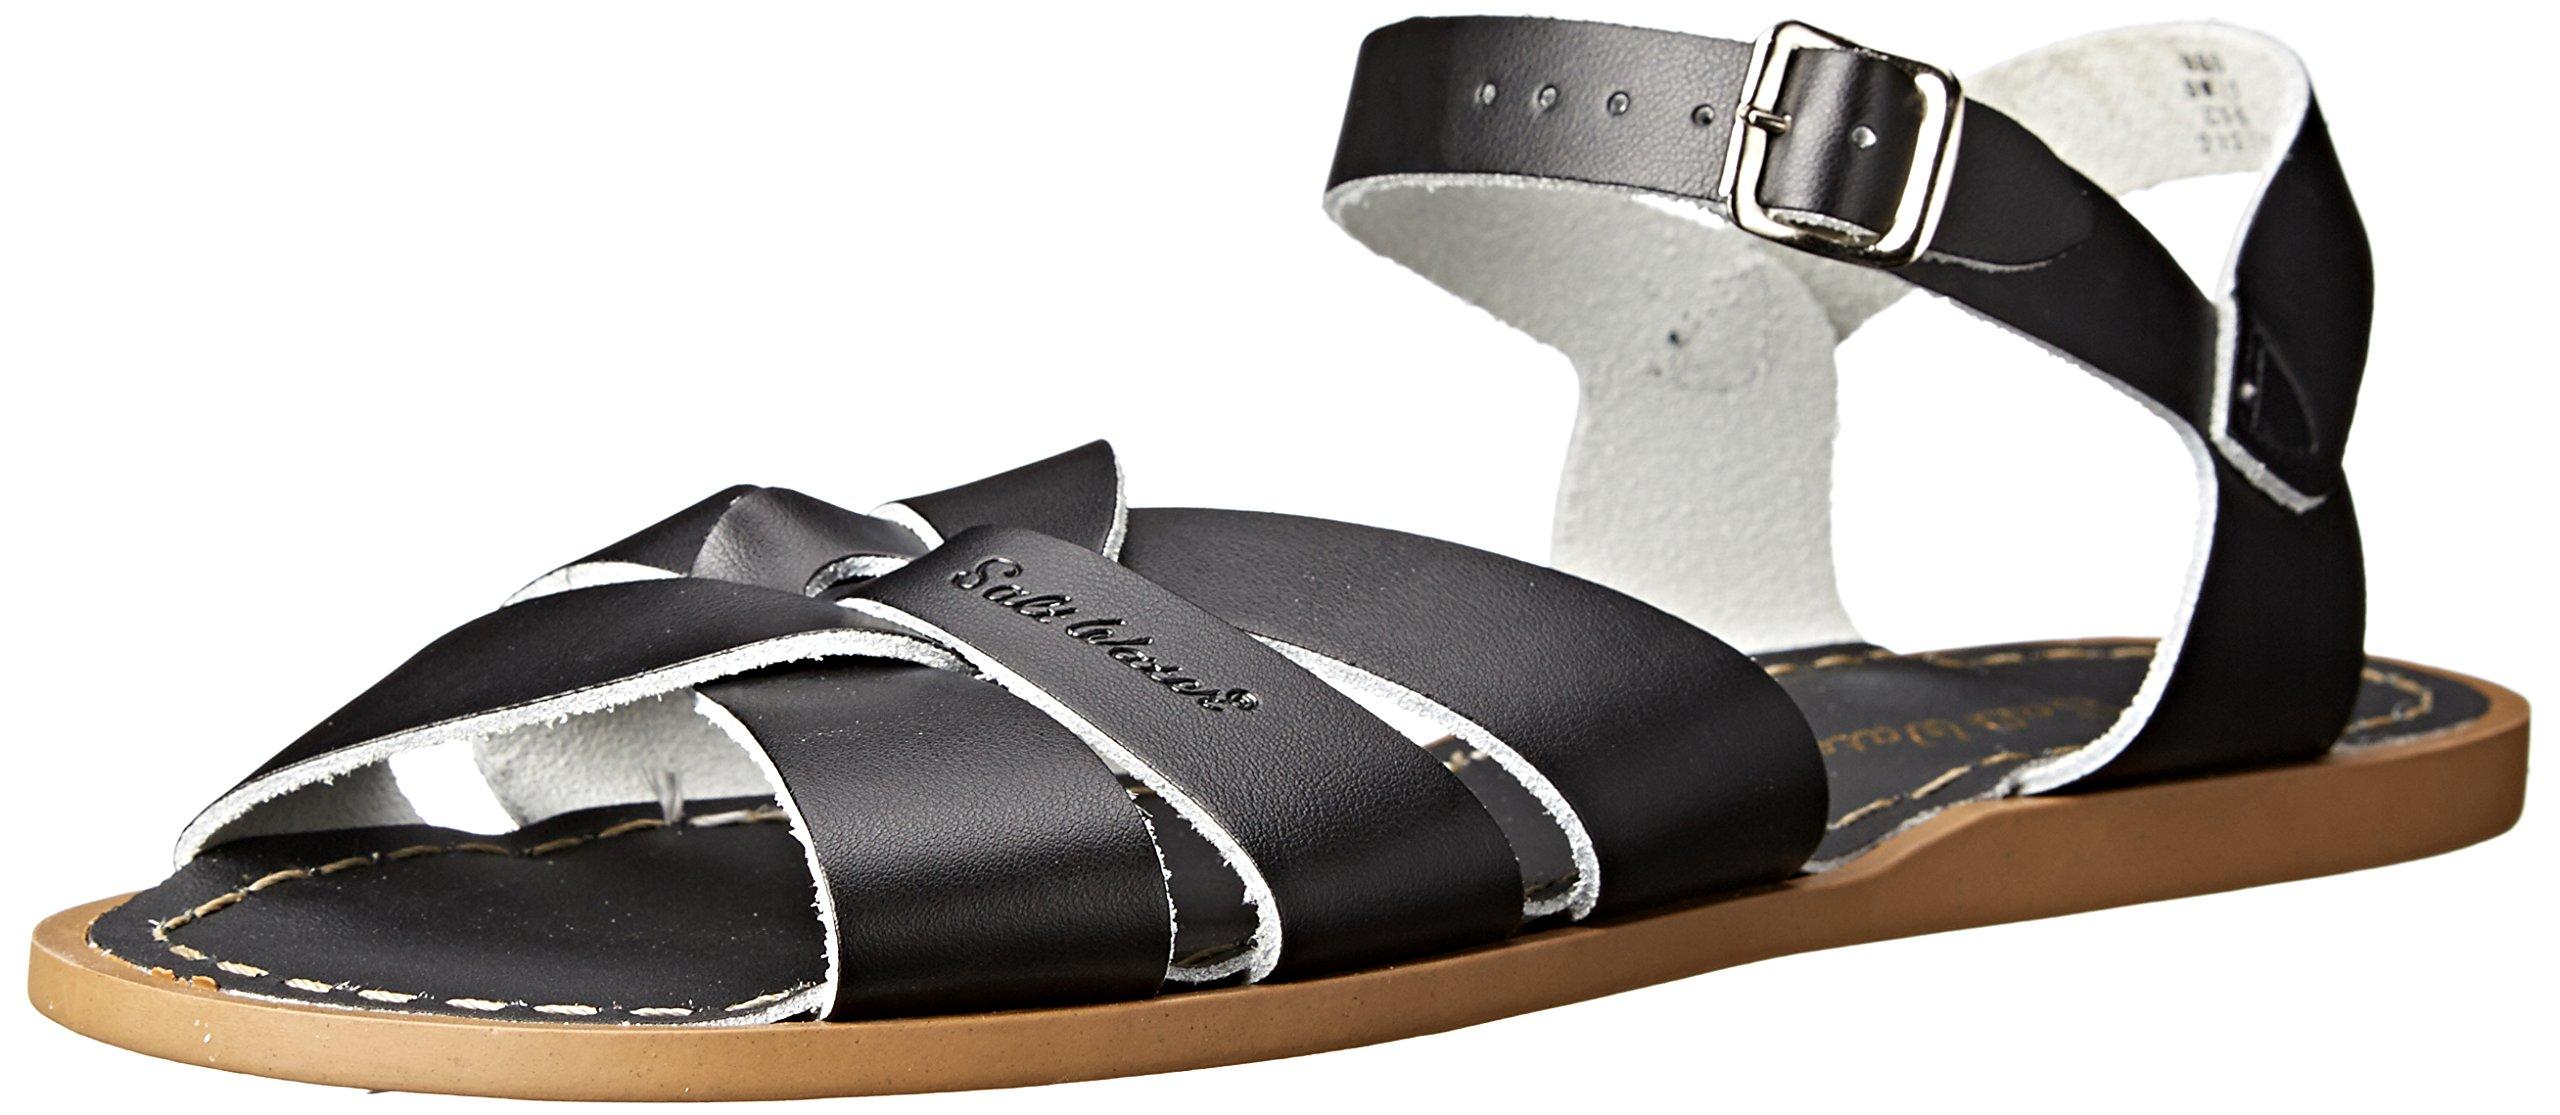 Salt Water Sandals by Hoy Shoe Original Sandal (Toddler/Little Kid/Big Kid/Women's), Black, 6 M US Big Kid